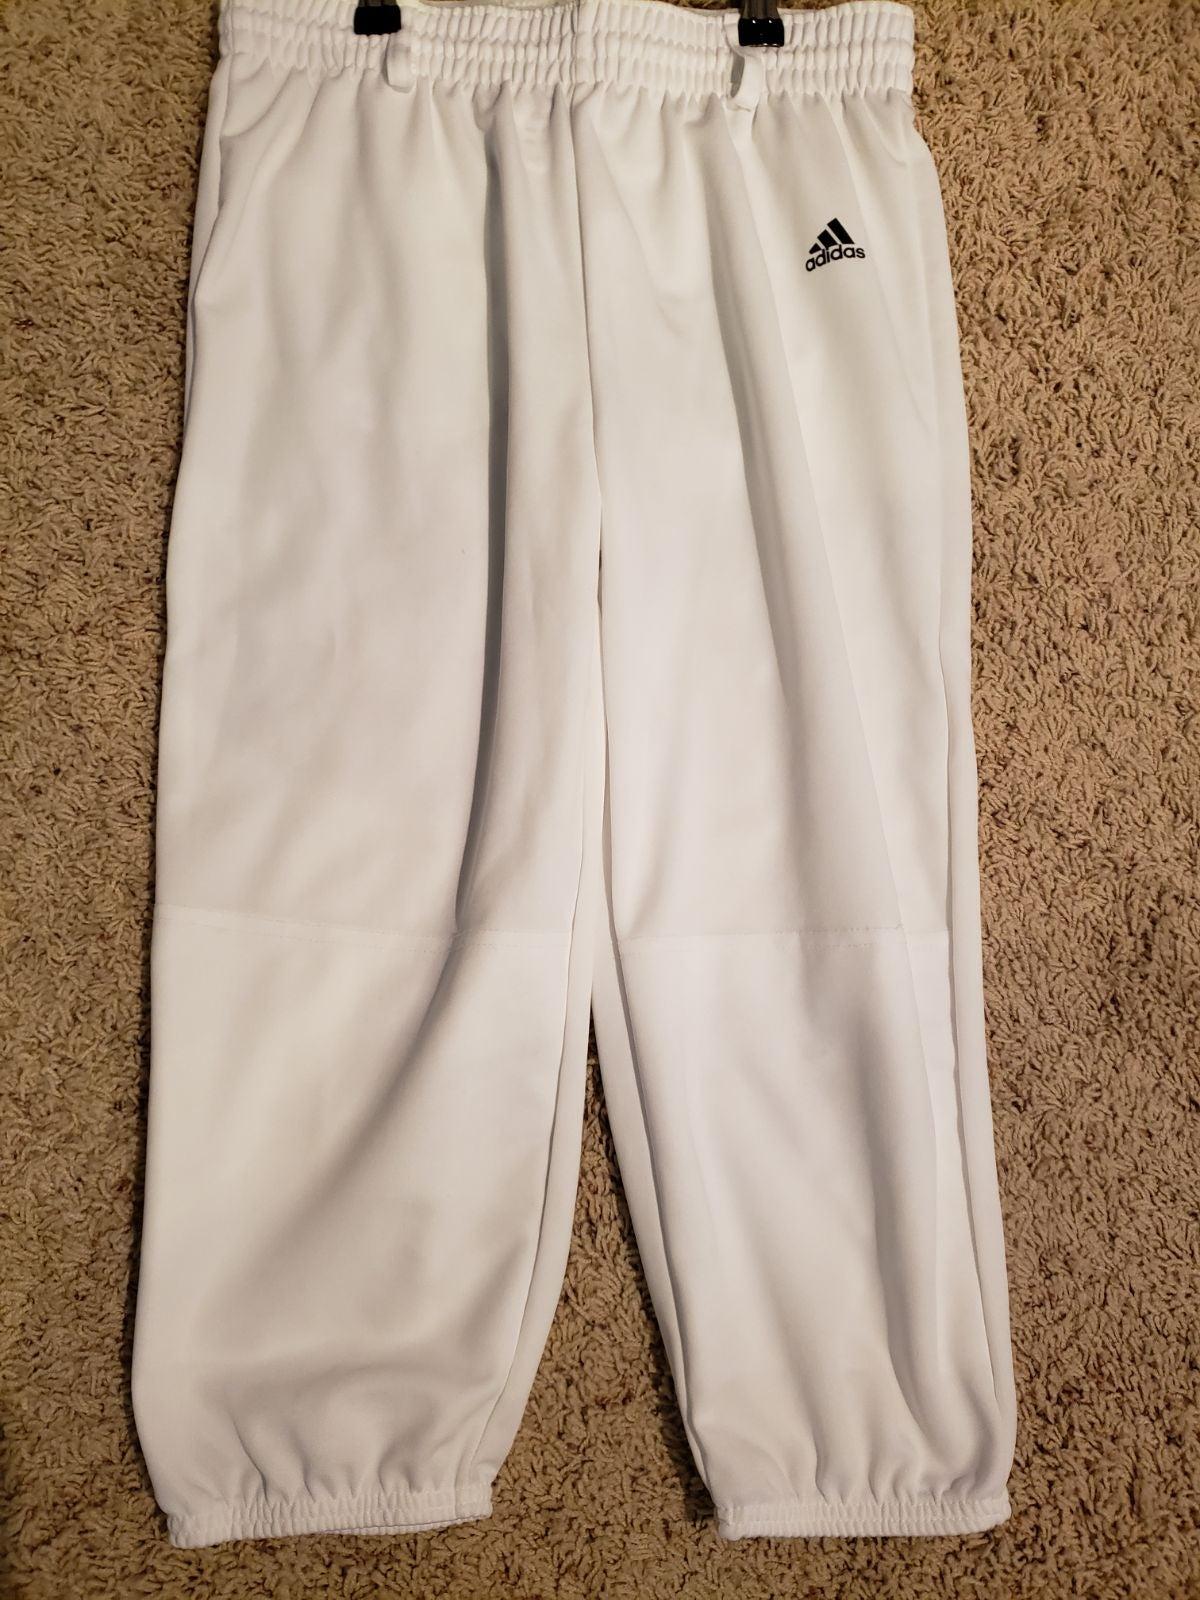 Adidas Baseball pants